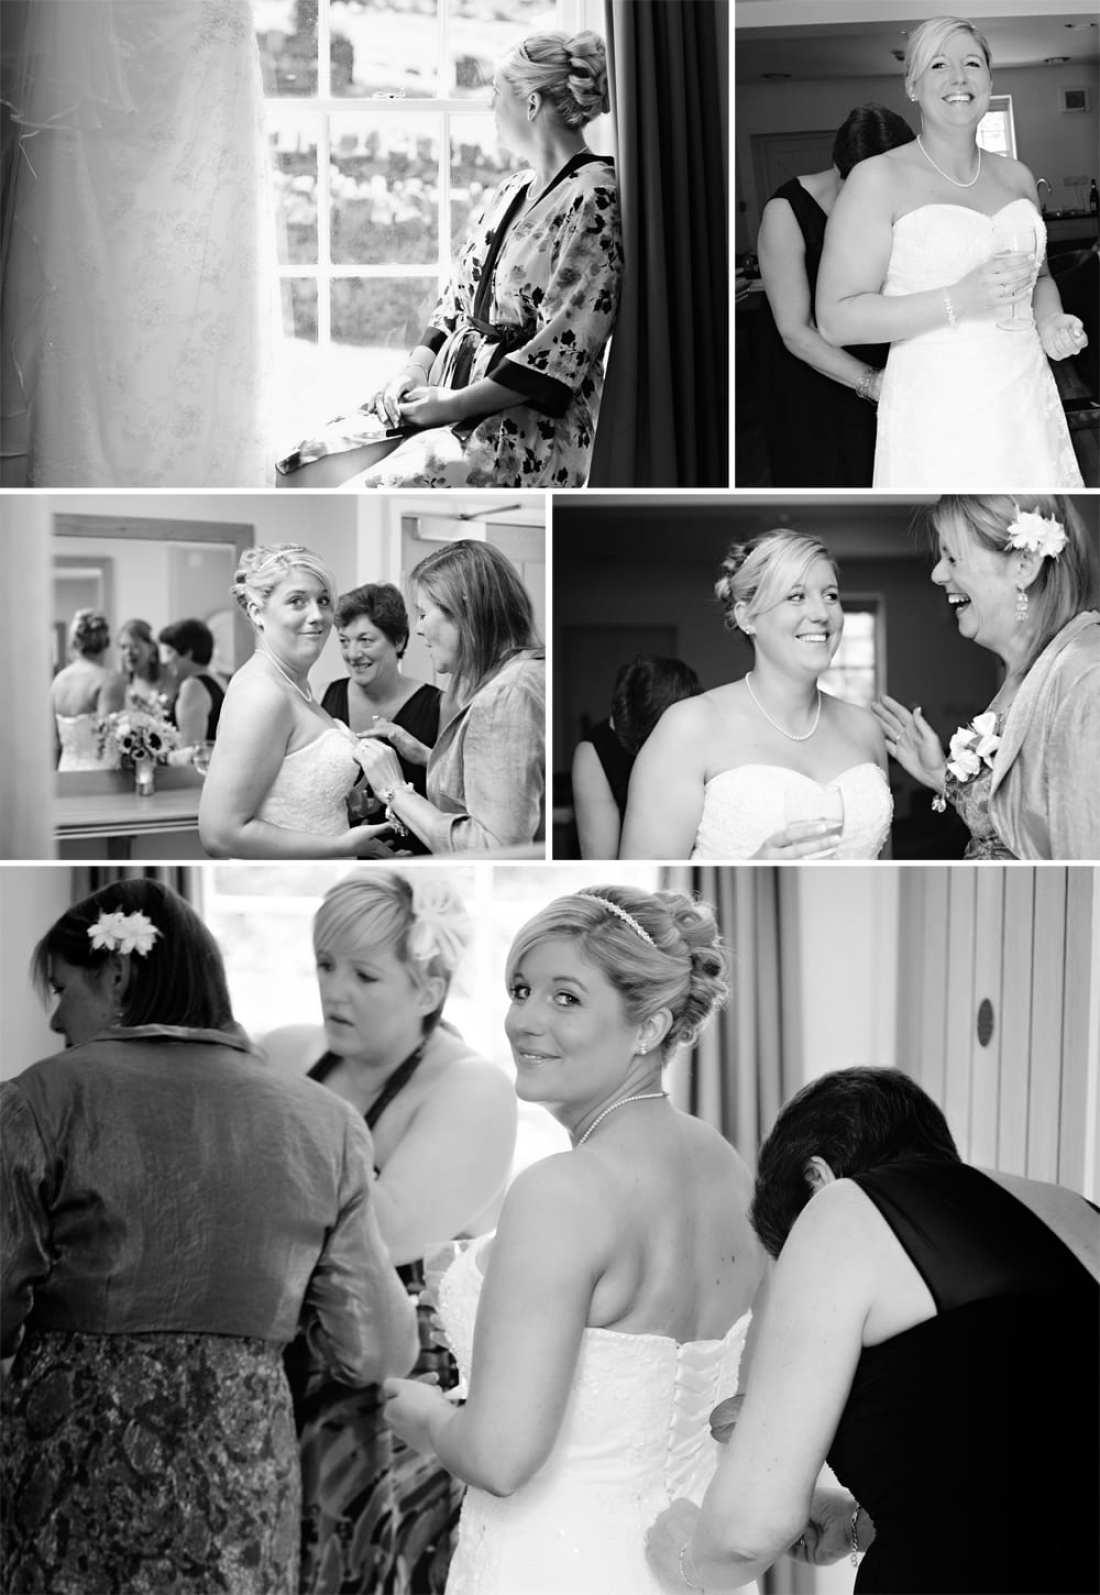 North Wales wedding - bride getting into dress